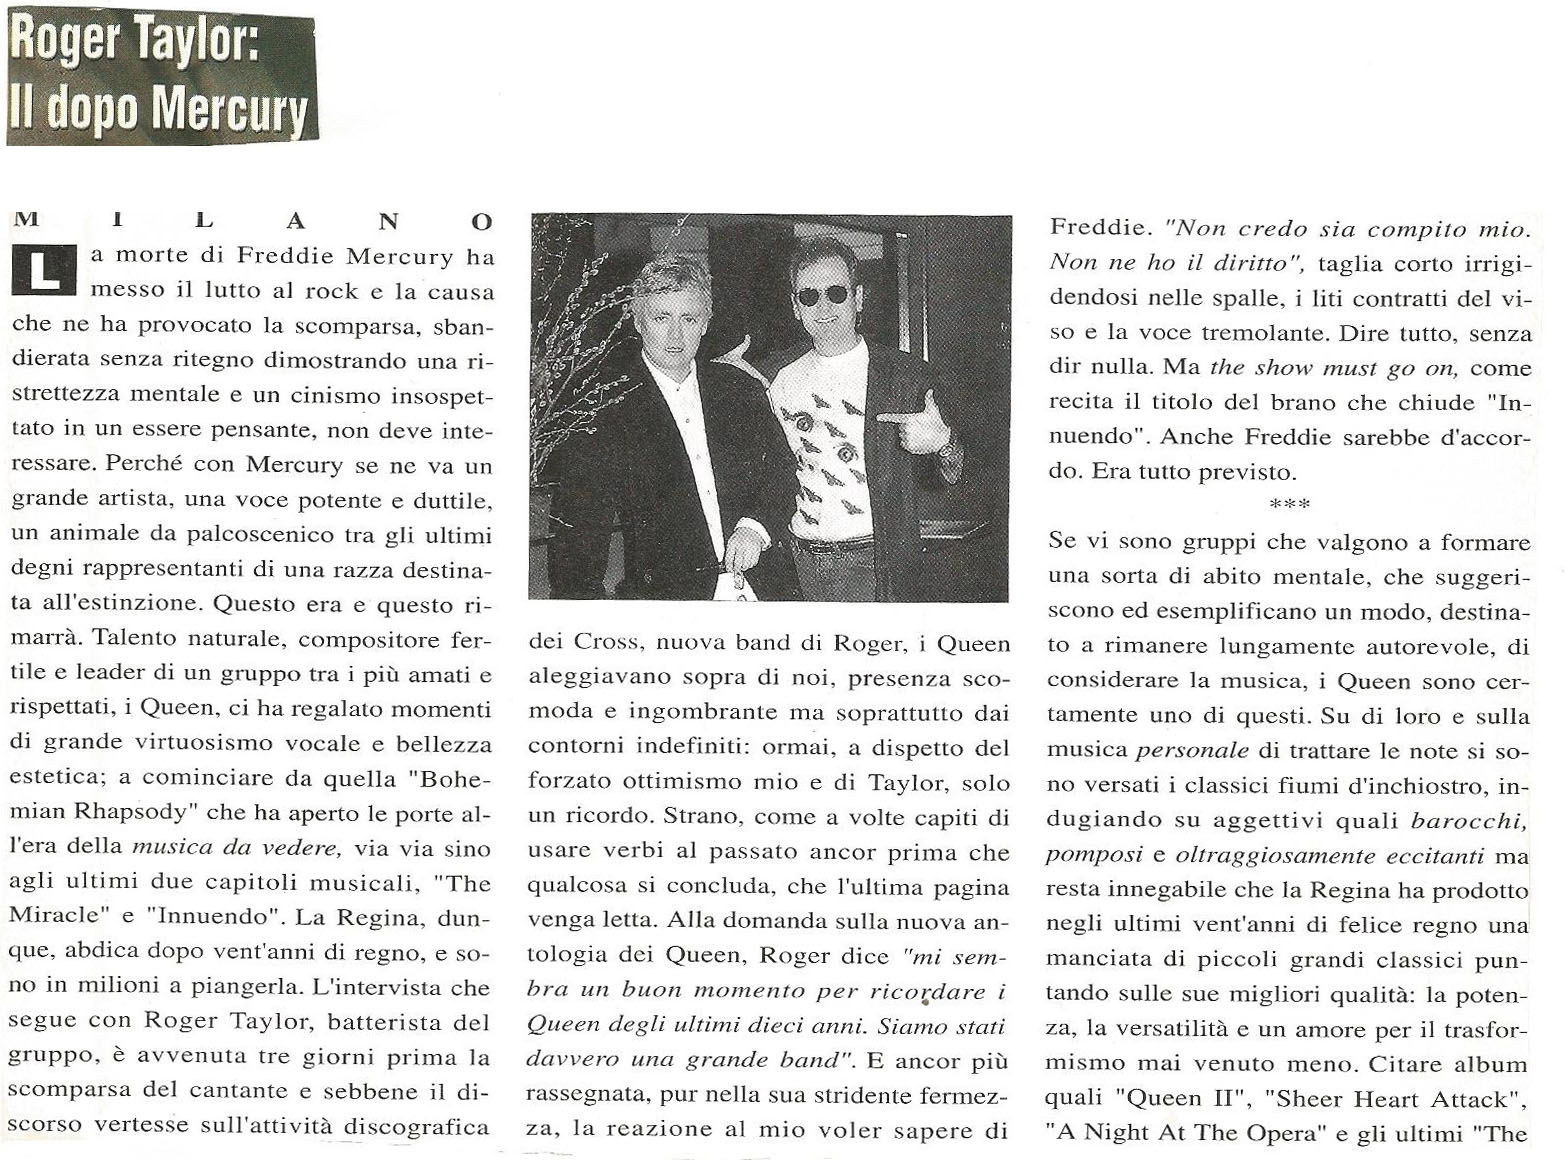 Rumore Novembre Intervista A Roger Taylor Tre